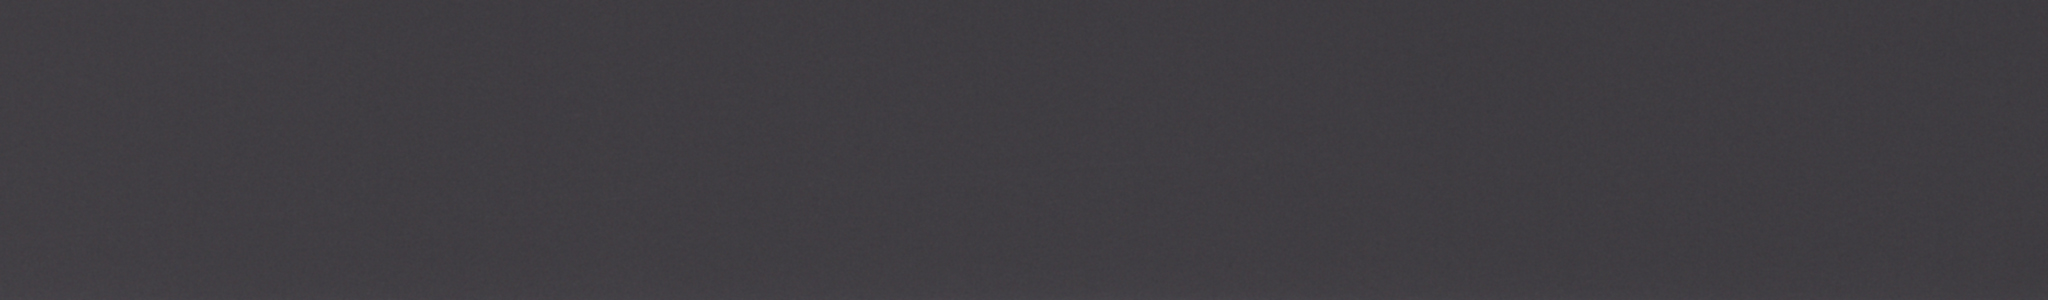 HU 193190 ABS hrana černá hladká mat